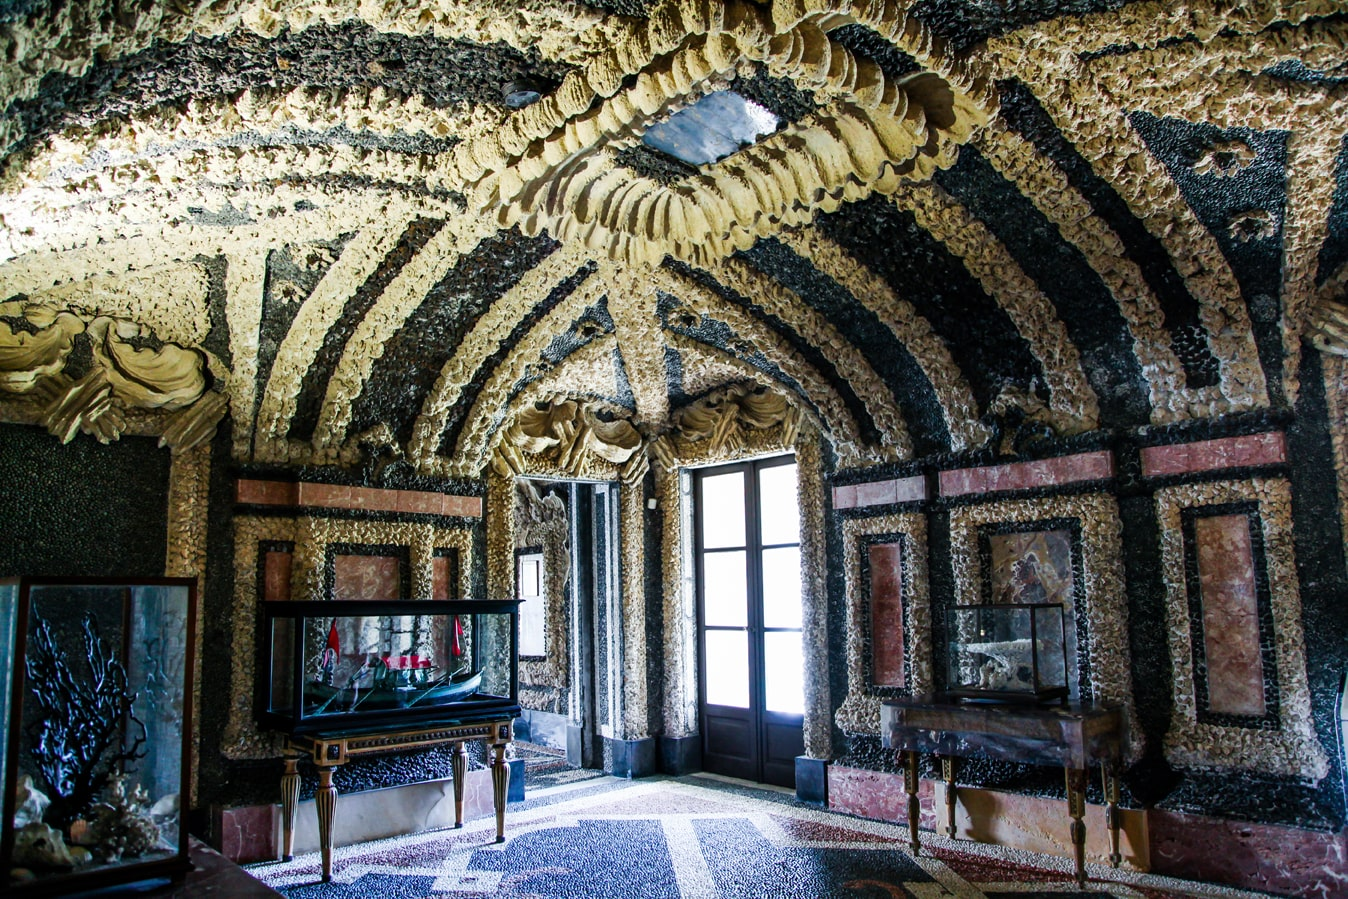 Дворцы Италии, дворец на острове Борромео, дворец из ракушек